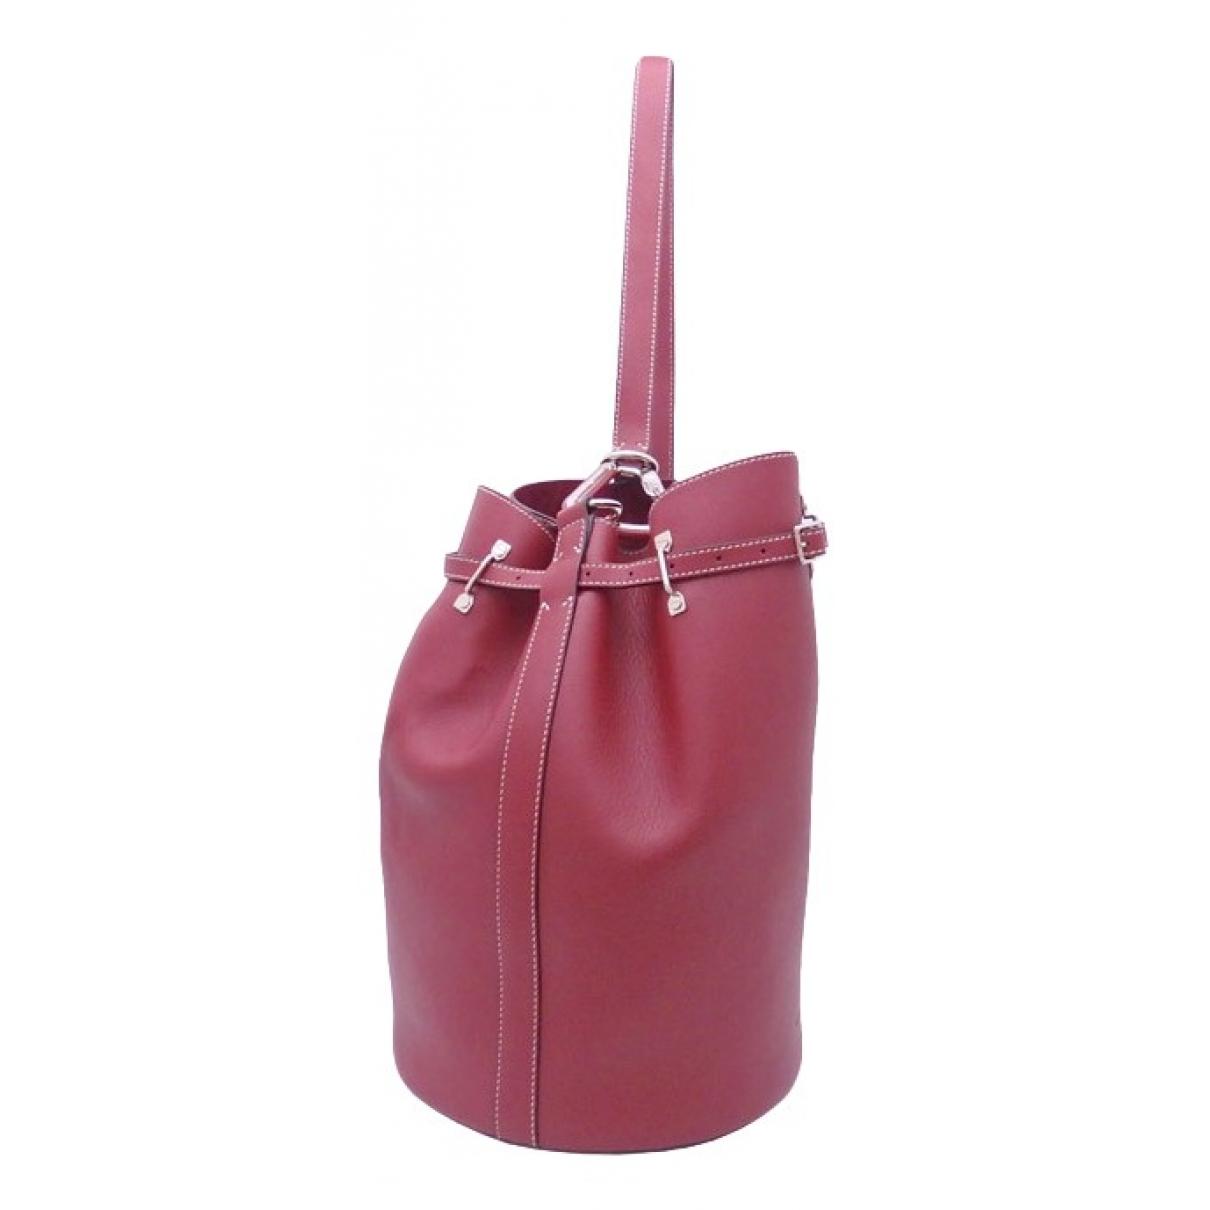 Bally \N Red Leather handbag for Women \N